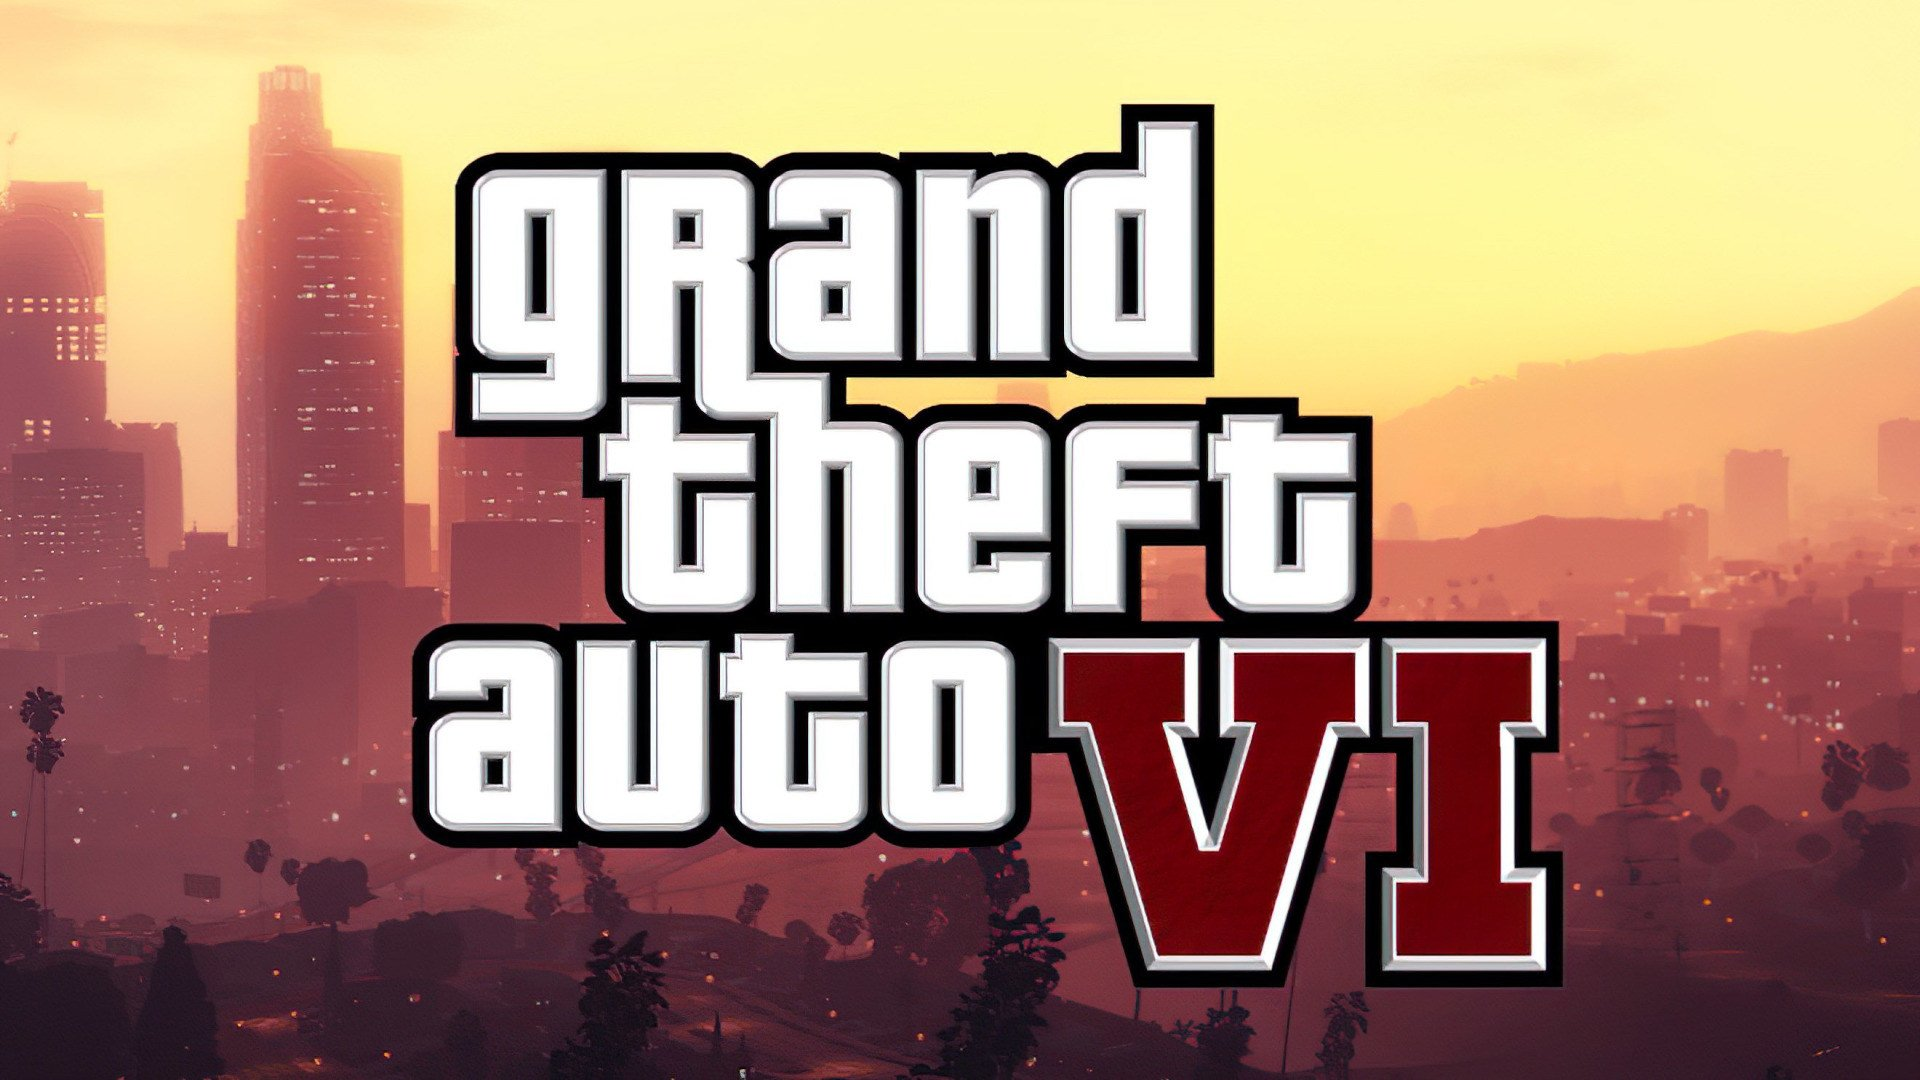 Gaming, Spiele, Logo, Games, Shooter, Rockstar Games, Gta, Take Two, GTA 6, Grand Theft Auto 6, GTA VI